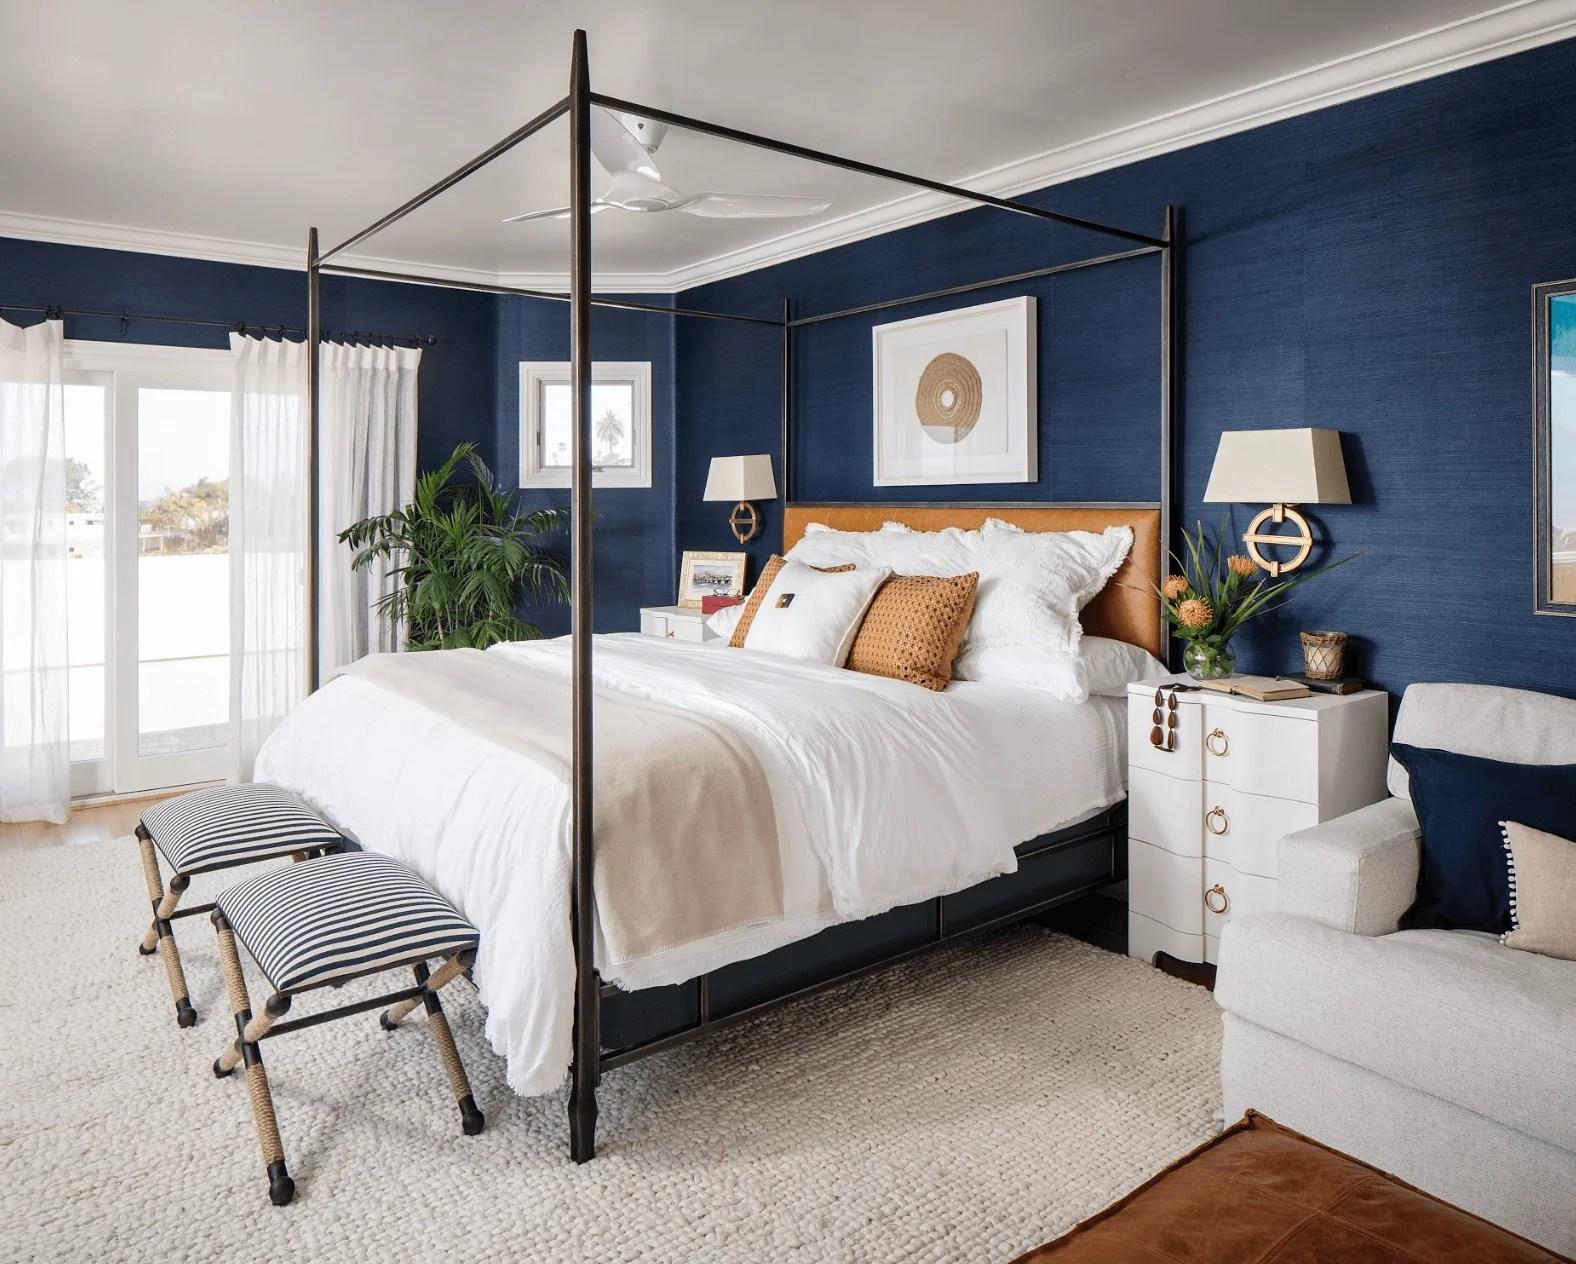 9 Cool Interior Design Trends for the Winter   Decorilla on Trendy Bedroom  id=44322